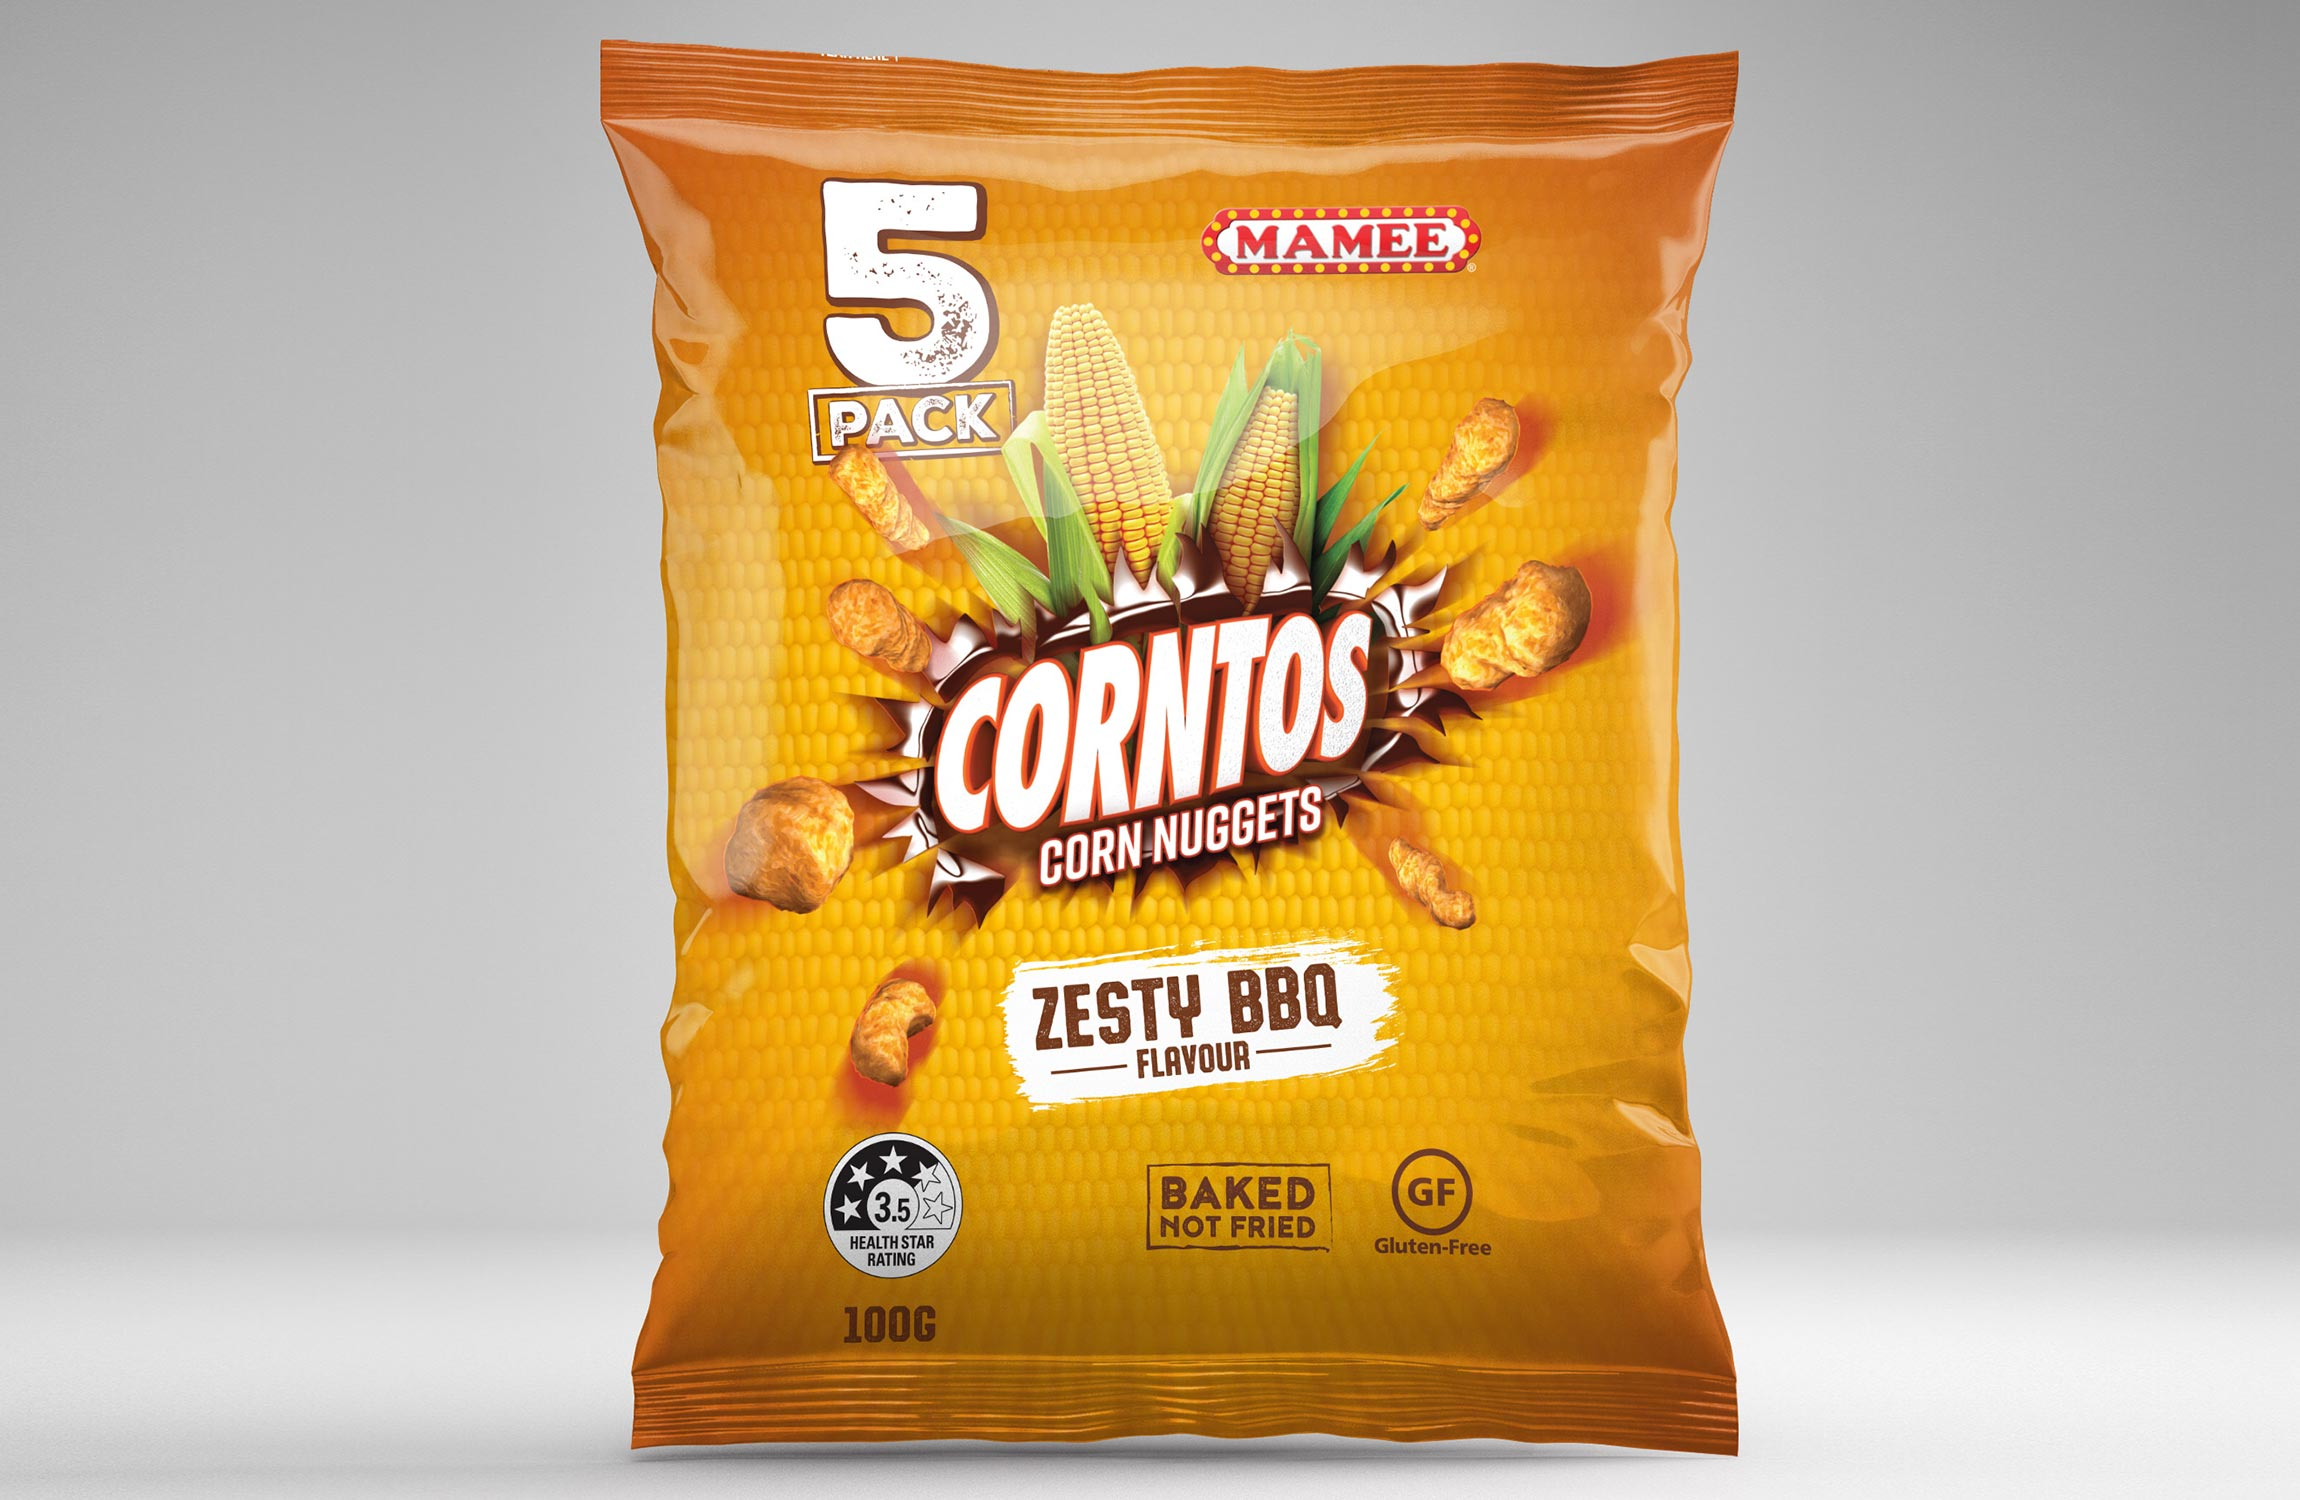 Mamee Corntos BBQ Packaging Design